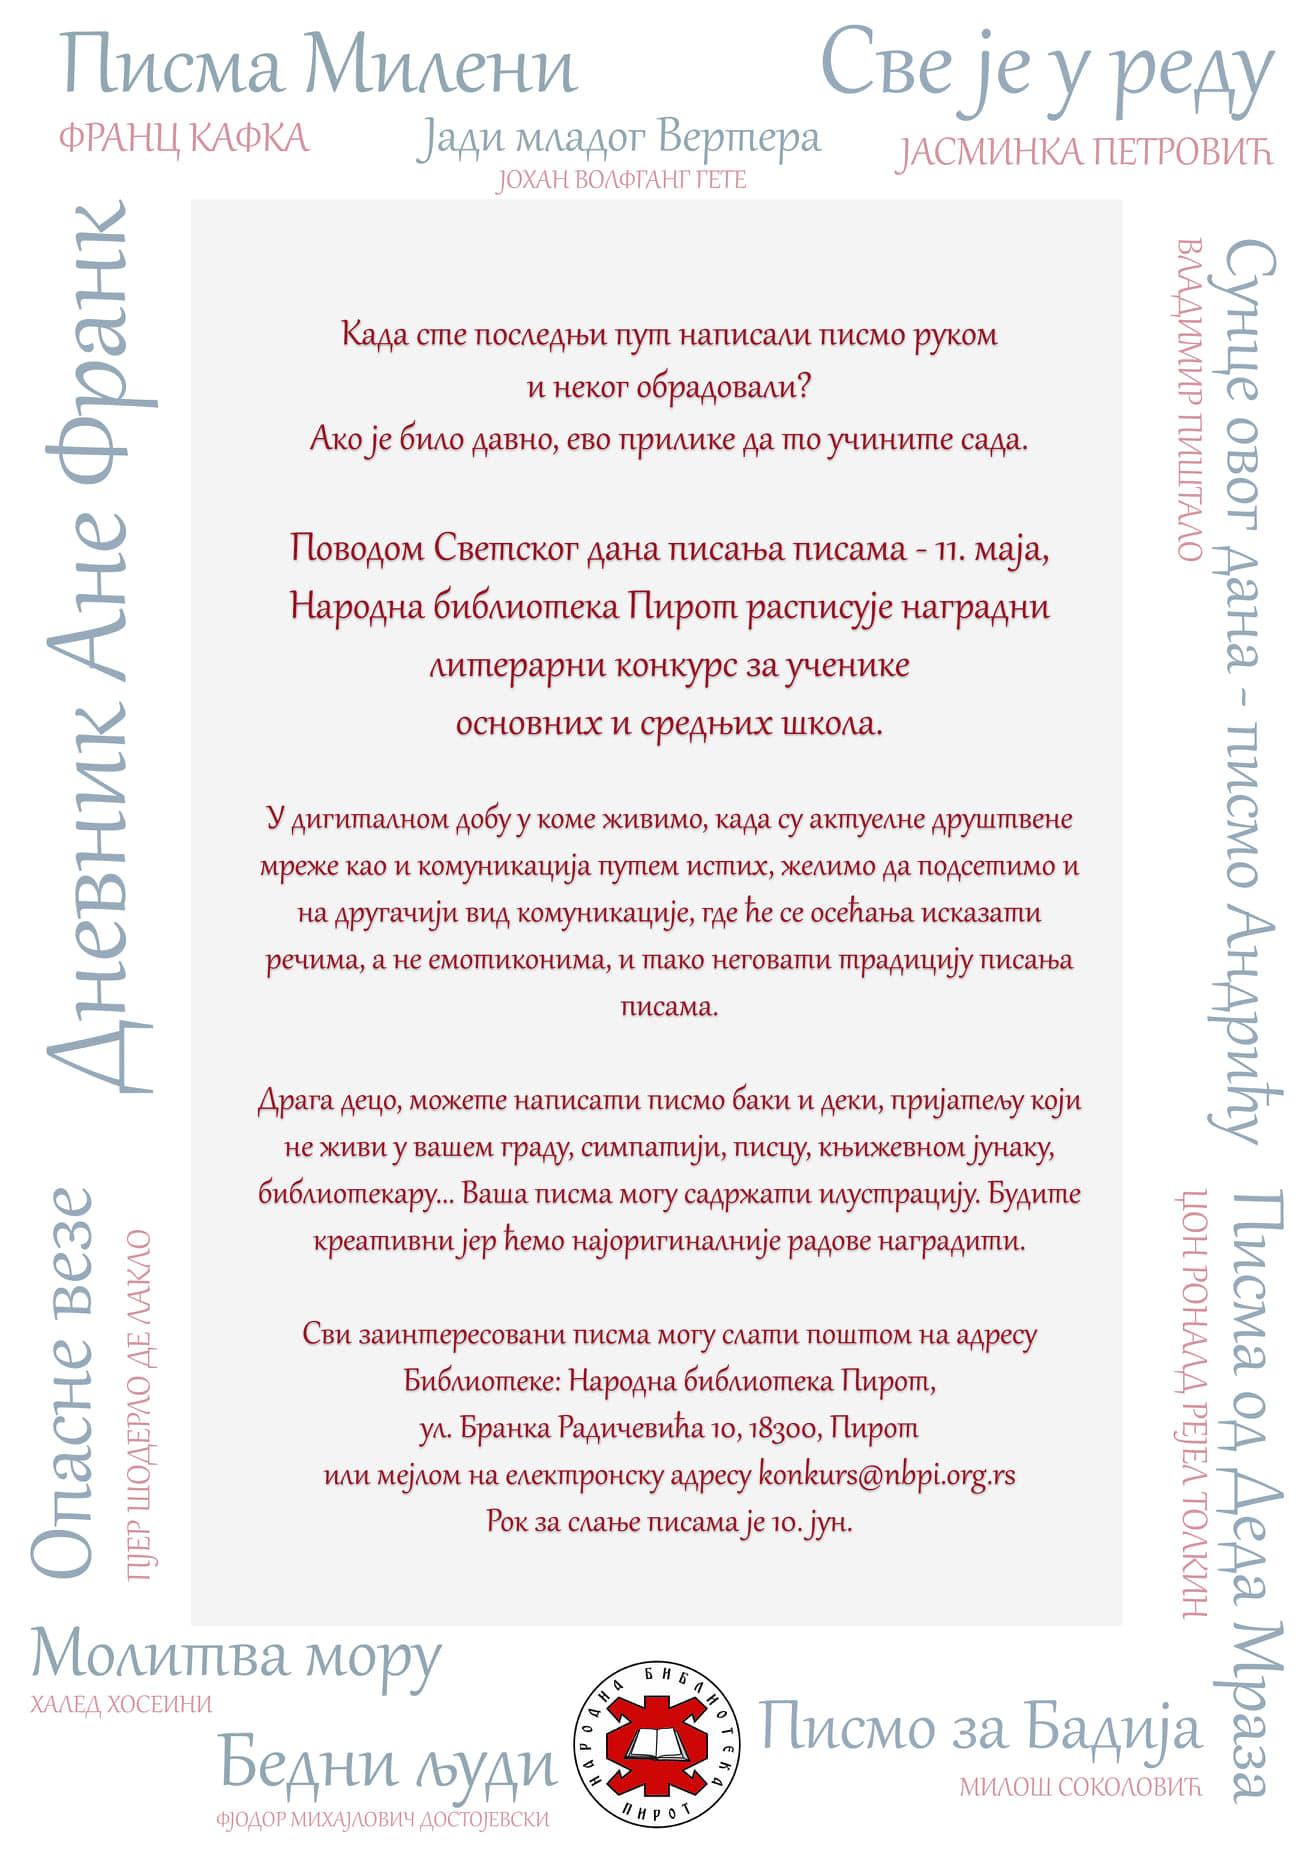 Photo of Narodna biblioteka Pirot: Nagradni konkurs povodom Svetskog dana pisanja pisama